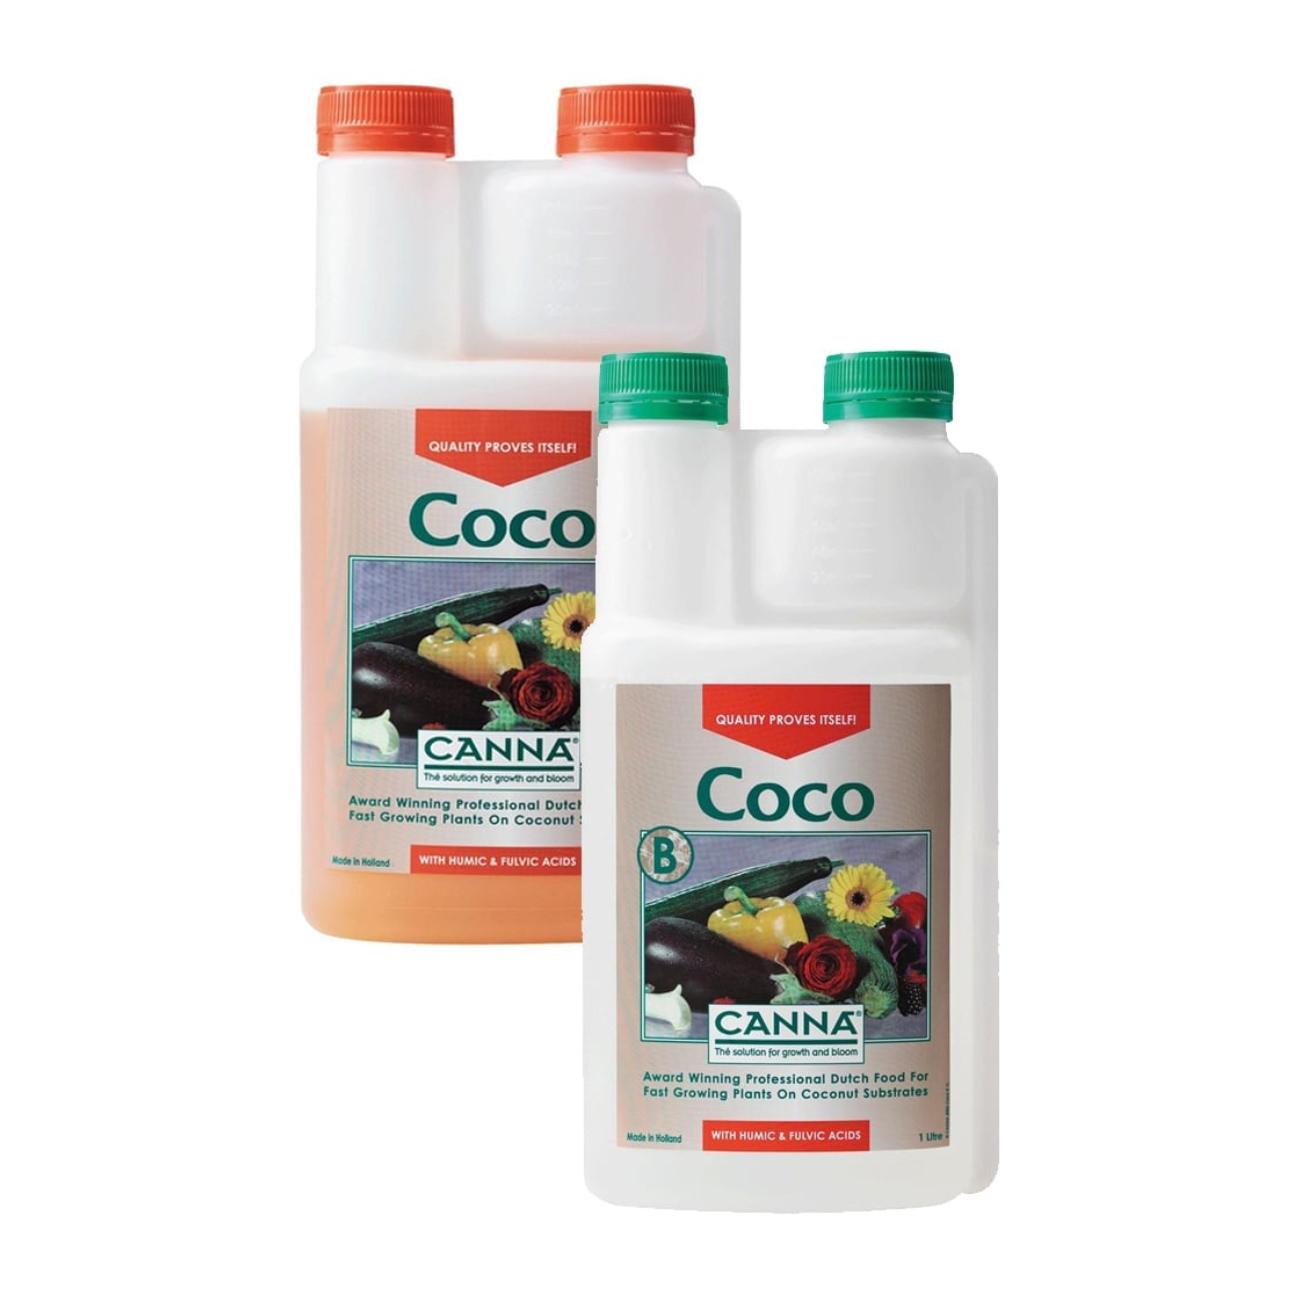 Canna Coco A & B nutrients